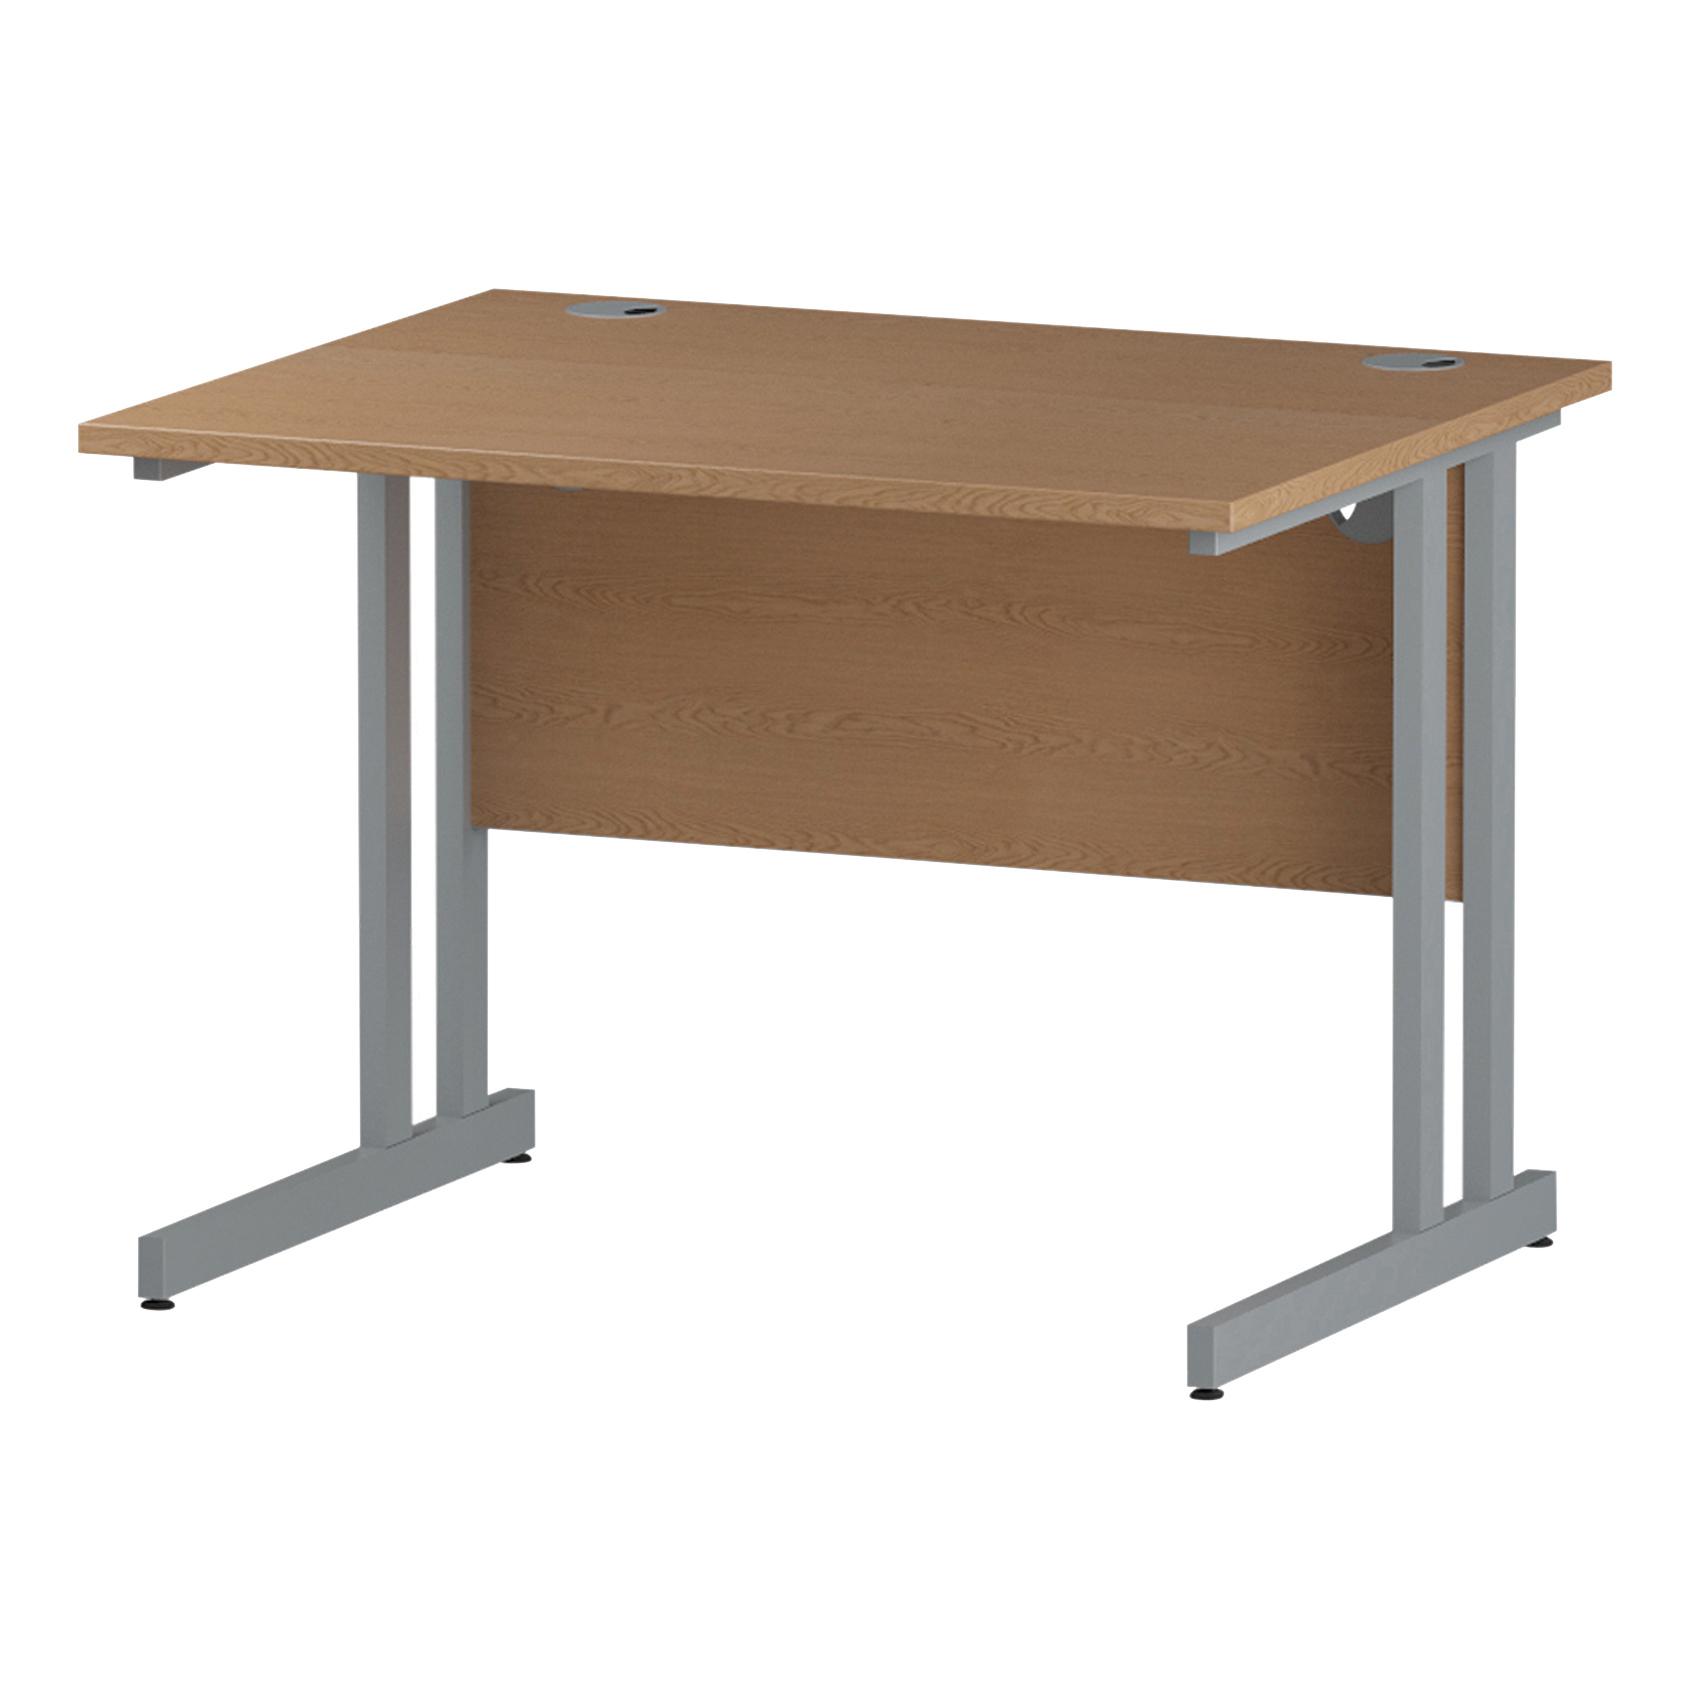 Trexus Rectangular Desk Silver Cantilever Leg 1000x800mm Oak Ref I000805